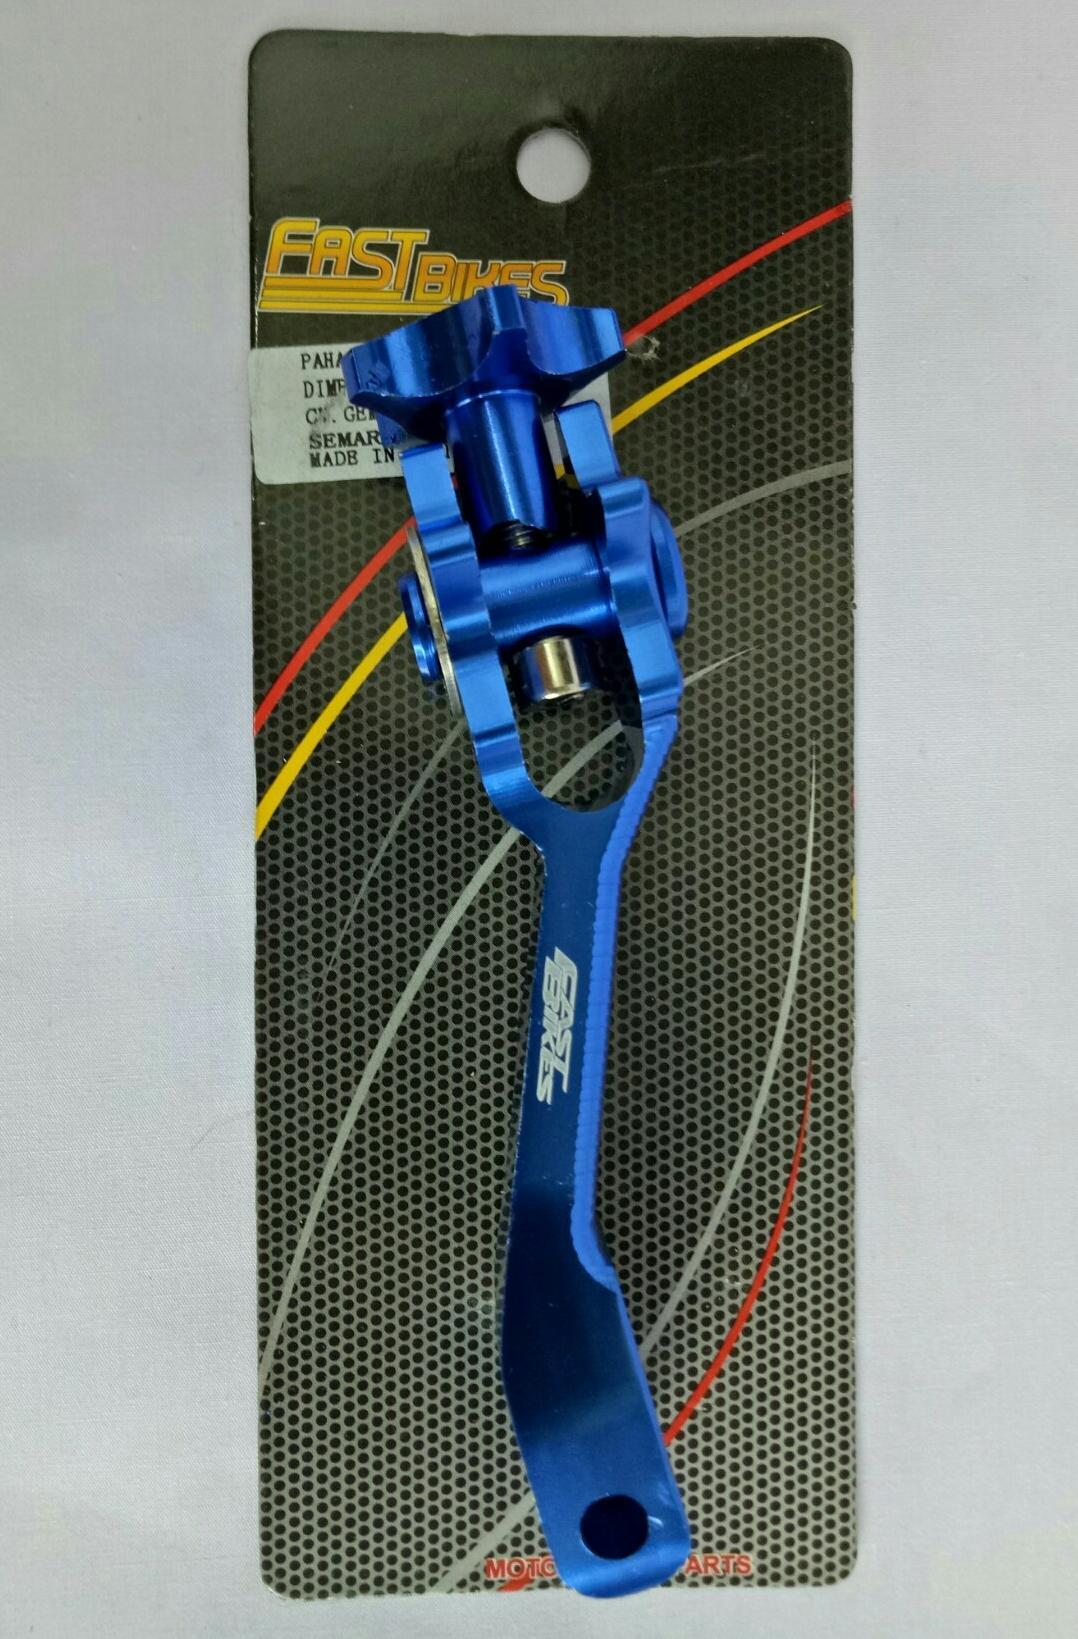 Kelebihan Fastbikes Paha Rem Universal Cnc Biru Terkini Daftar Detail Gambar Terbaru